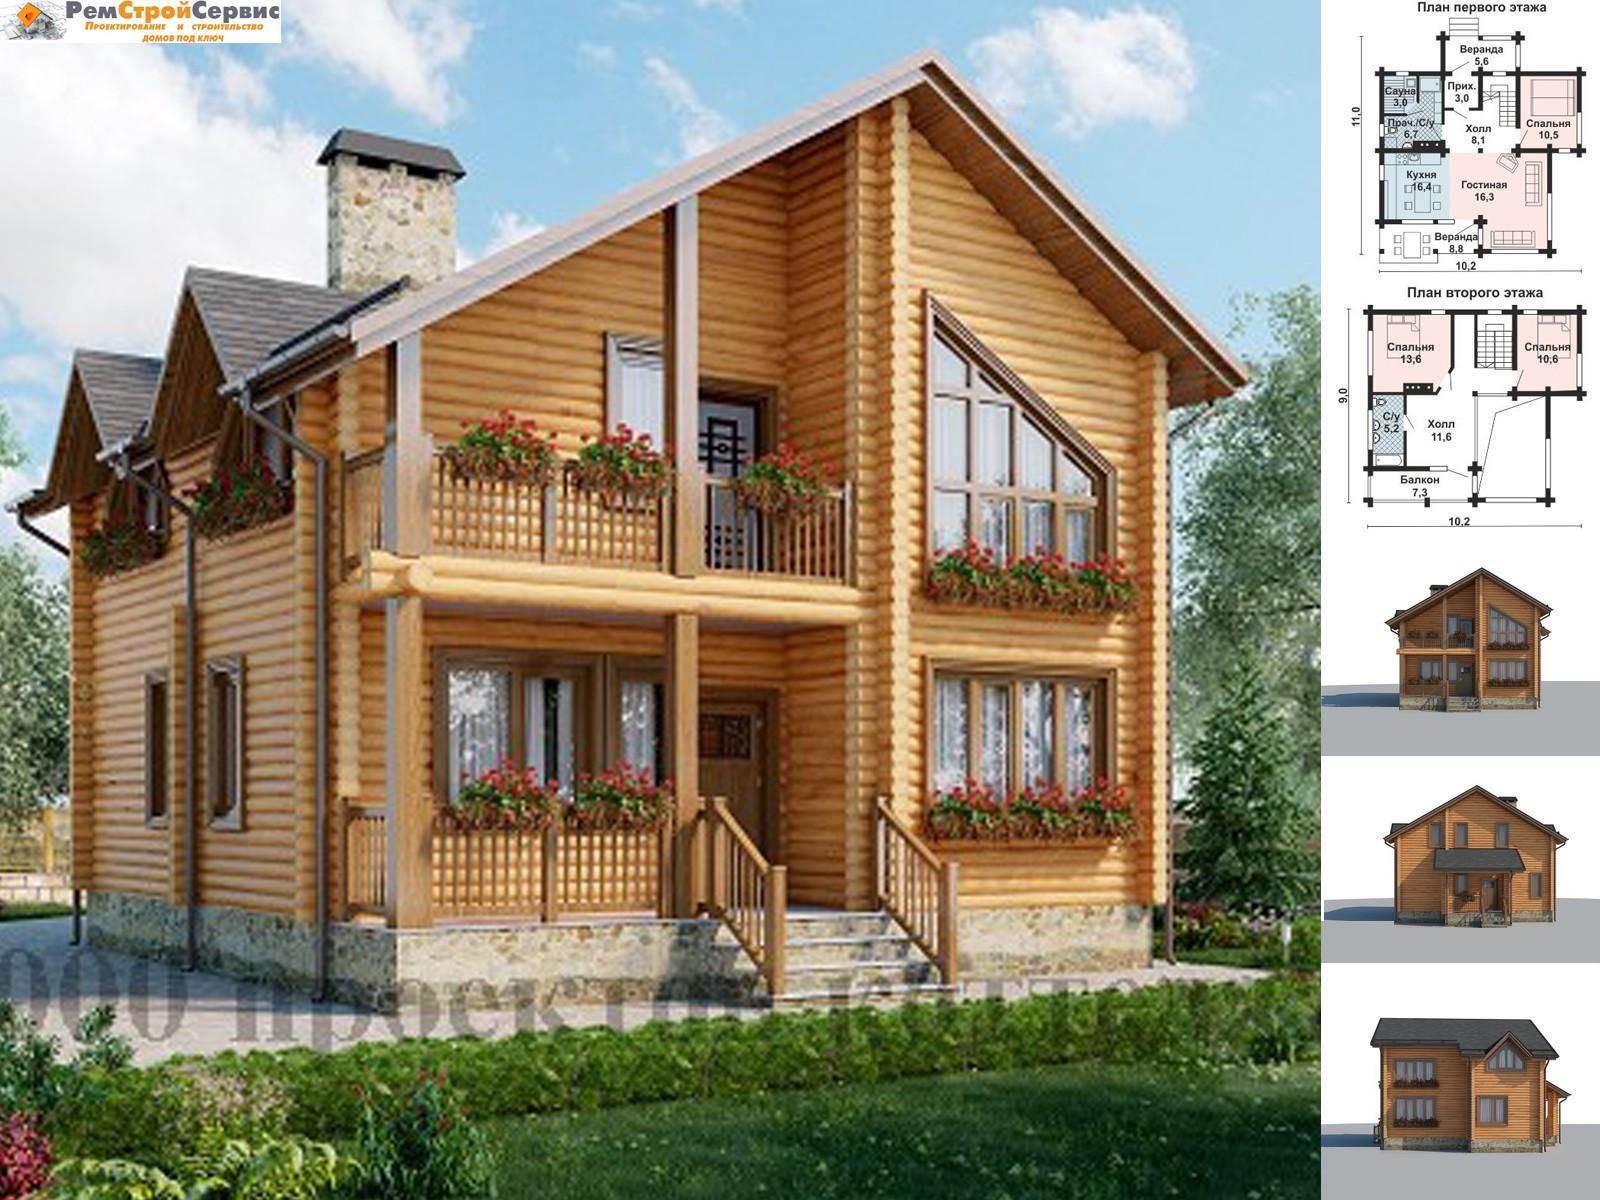 Проект дома as-2193 ремстройсервис в домодедово.